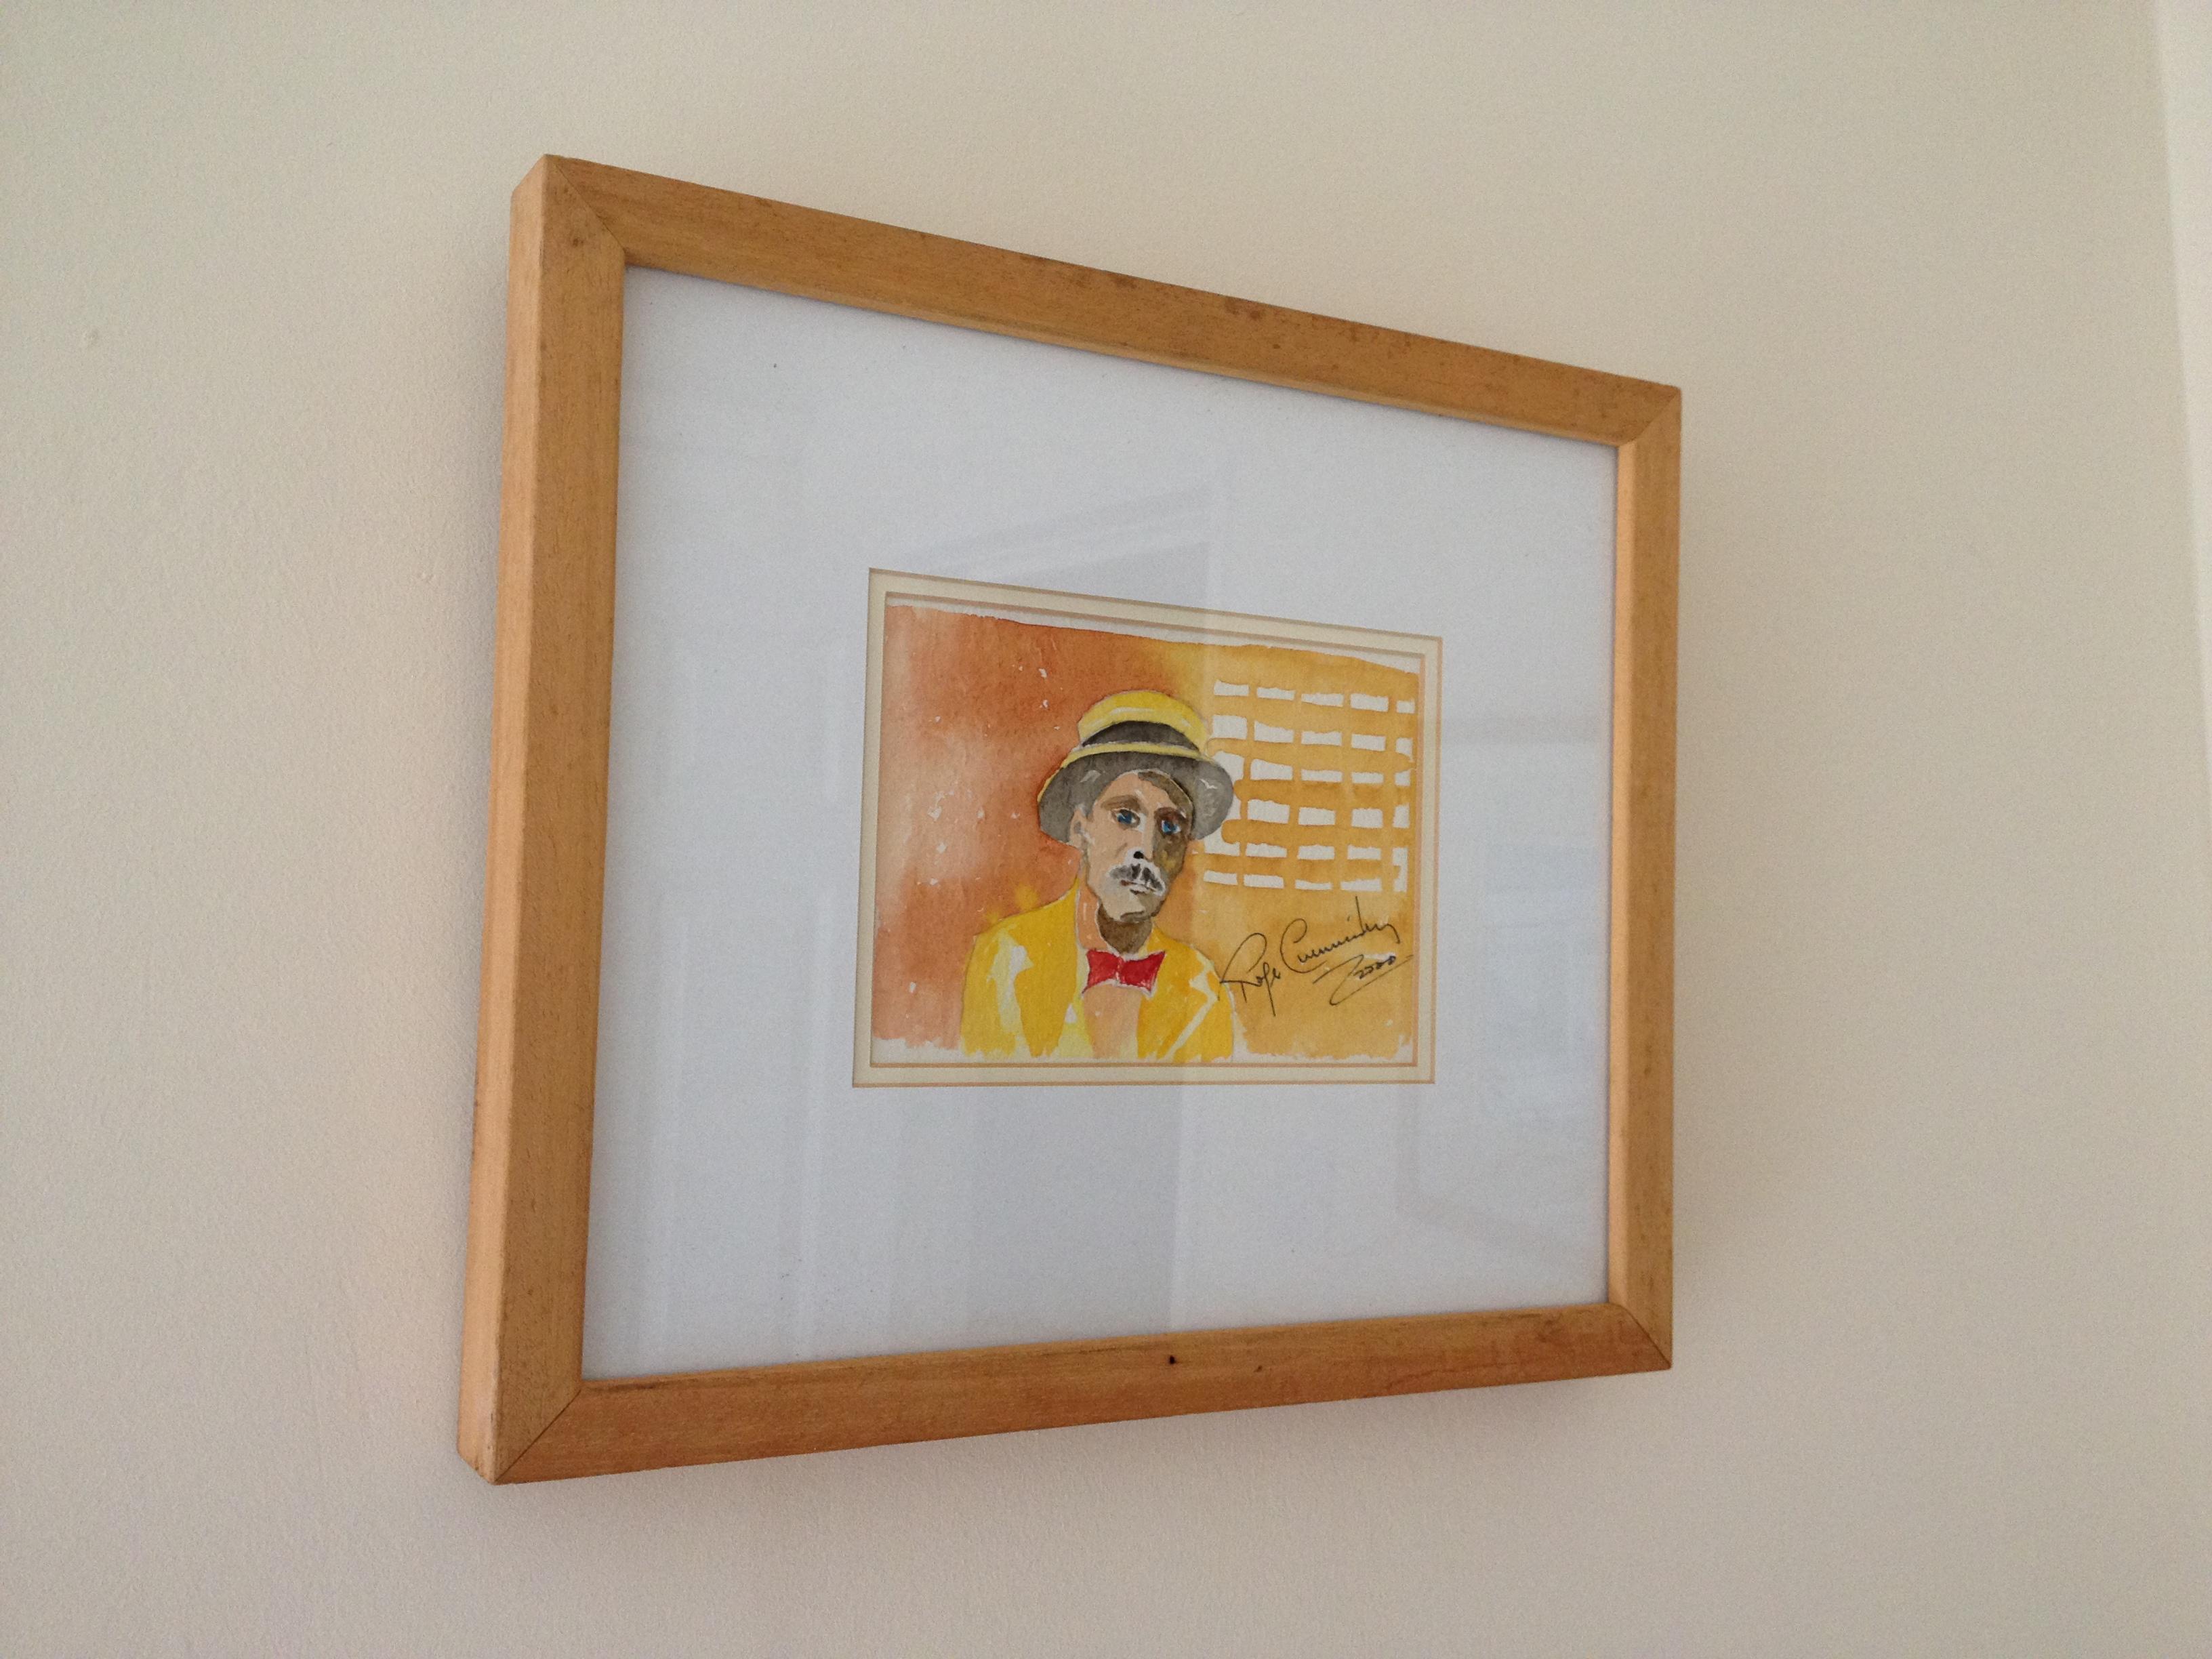 Portrait of James Joyce